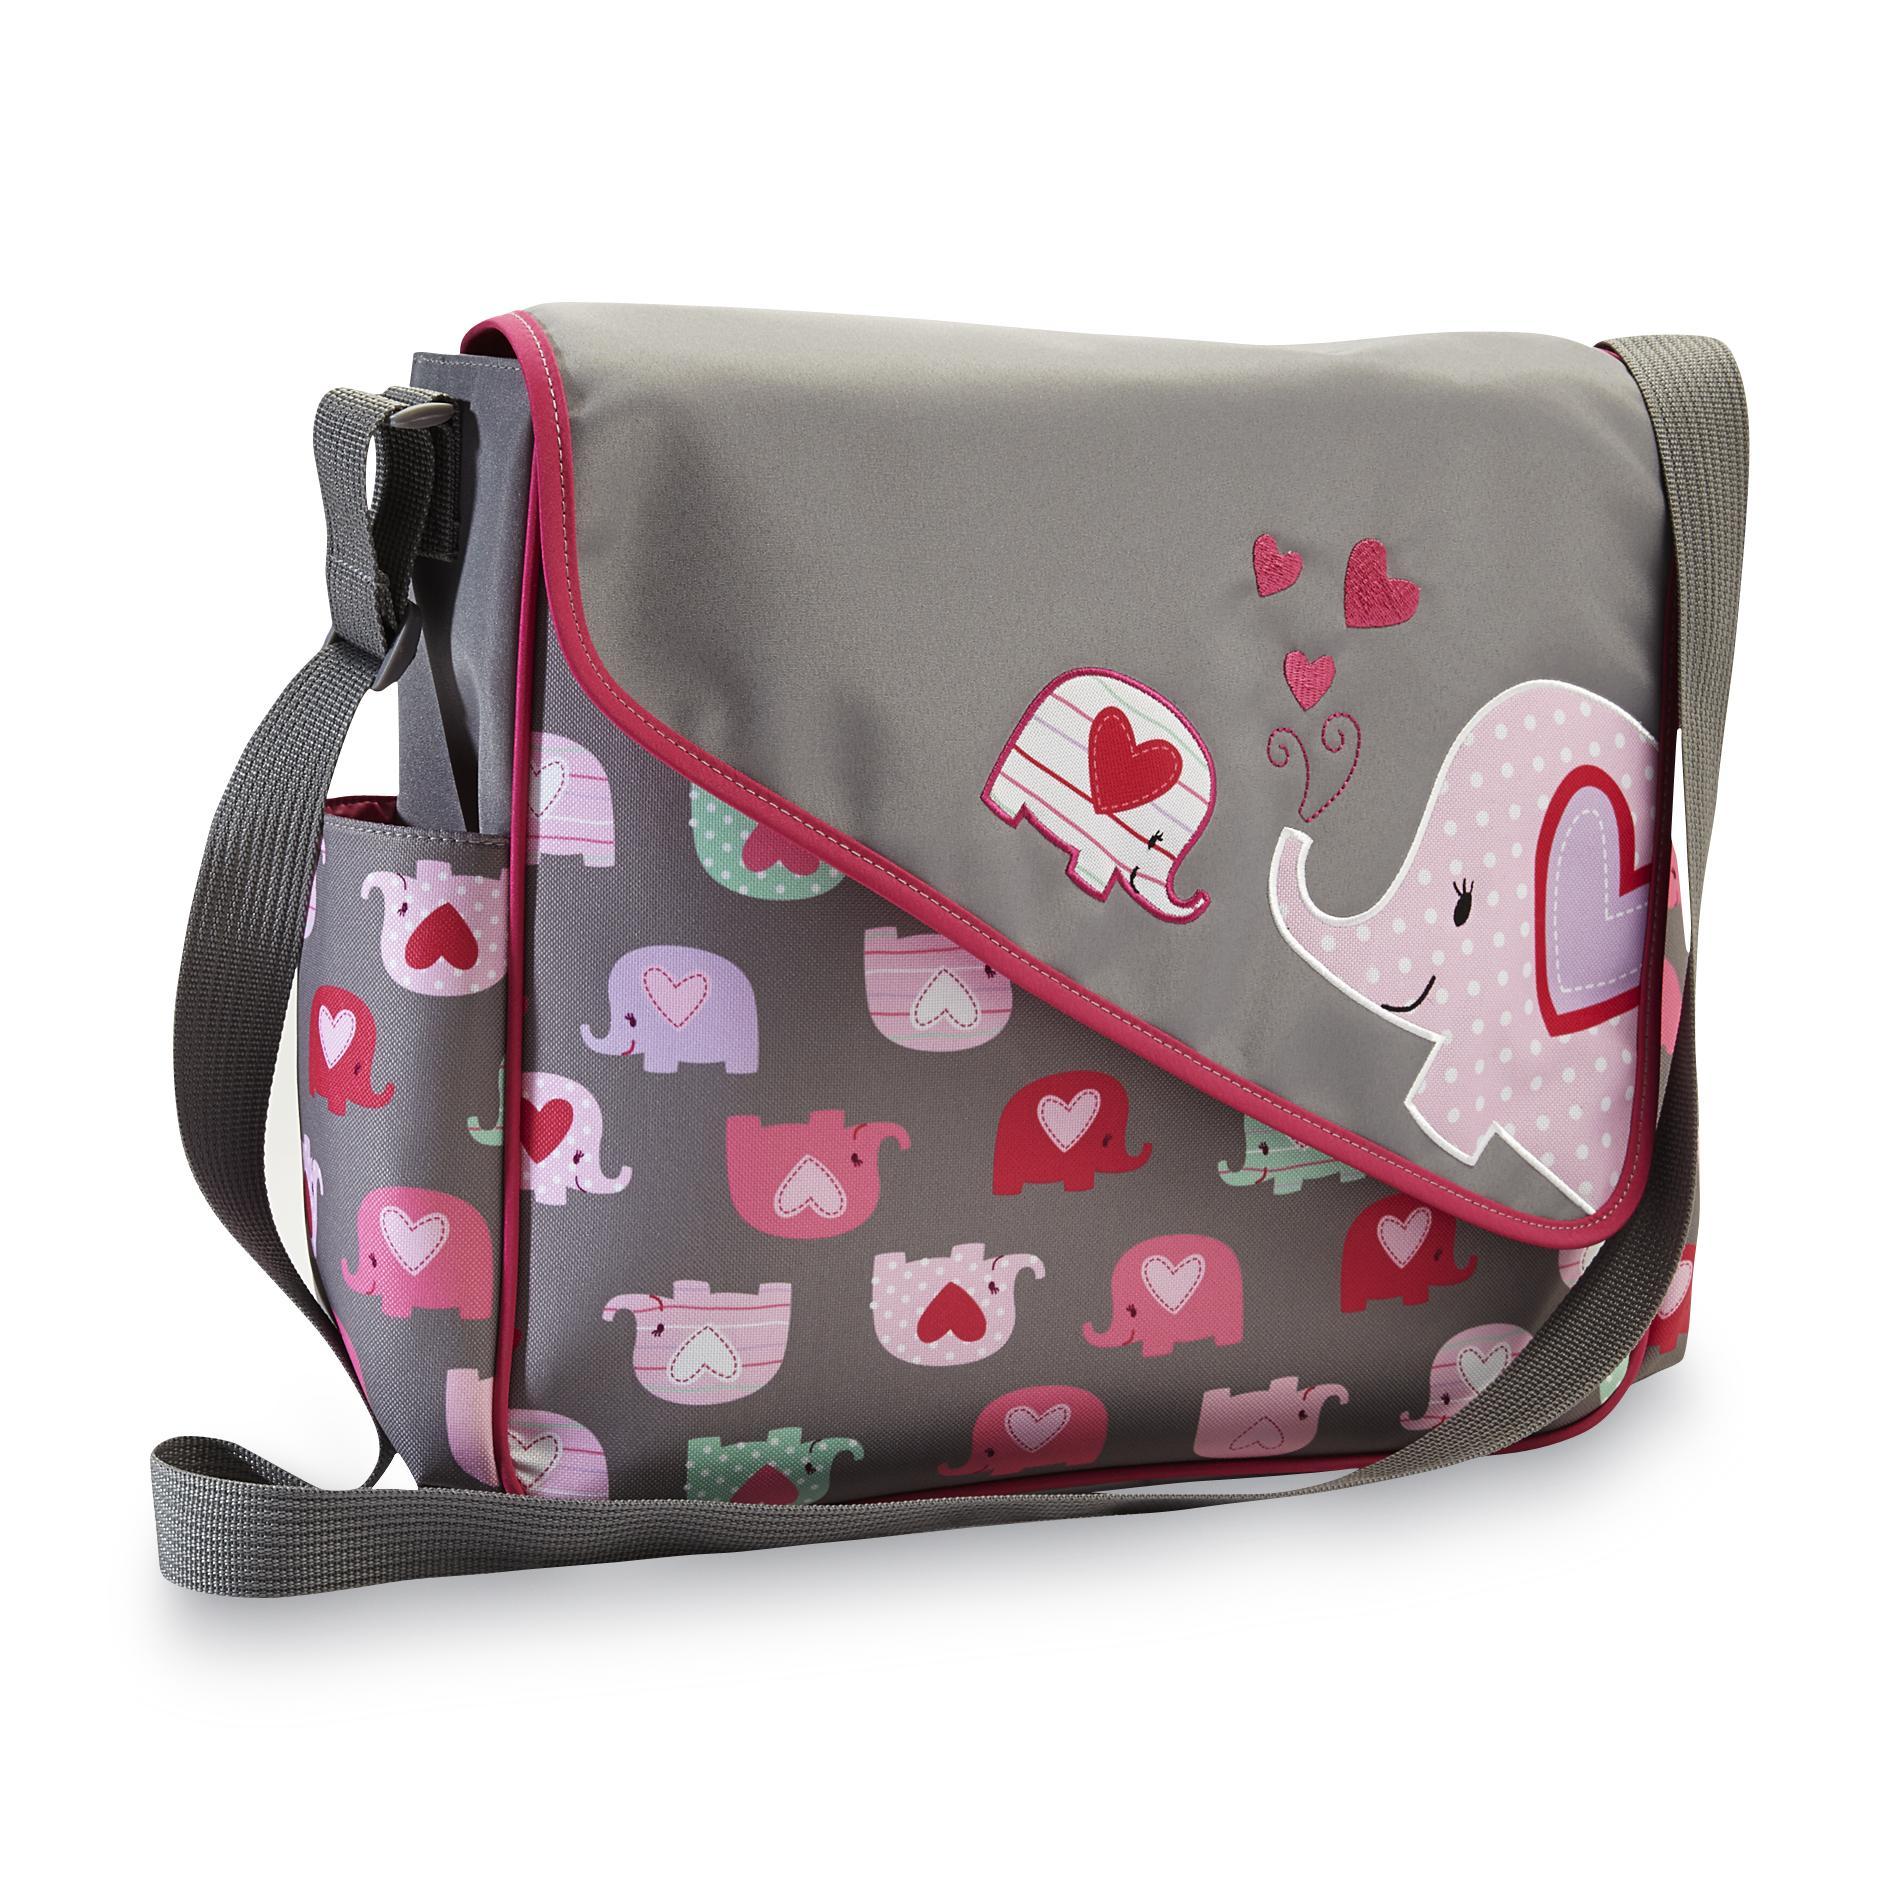 Messenger Diaper Bag & Changing Pad - Elephants